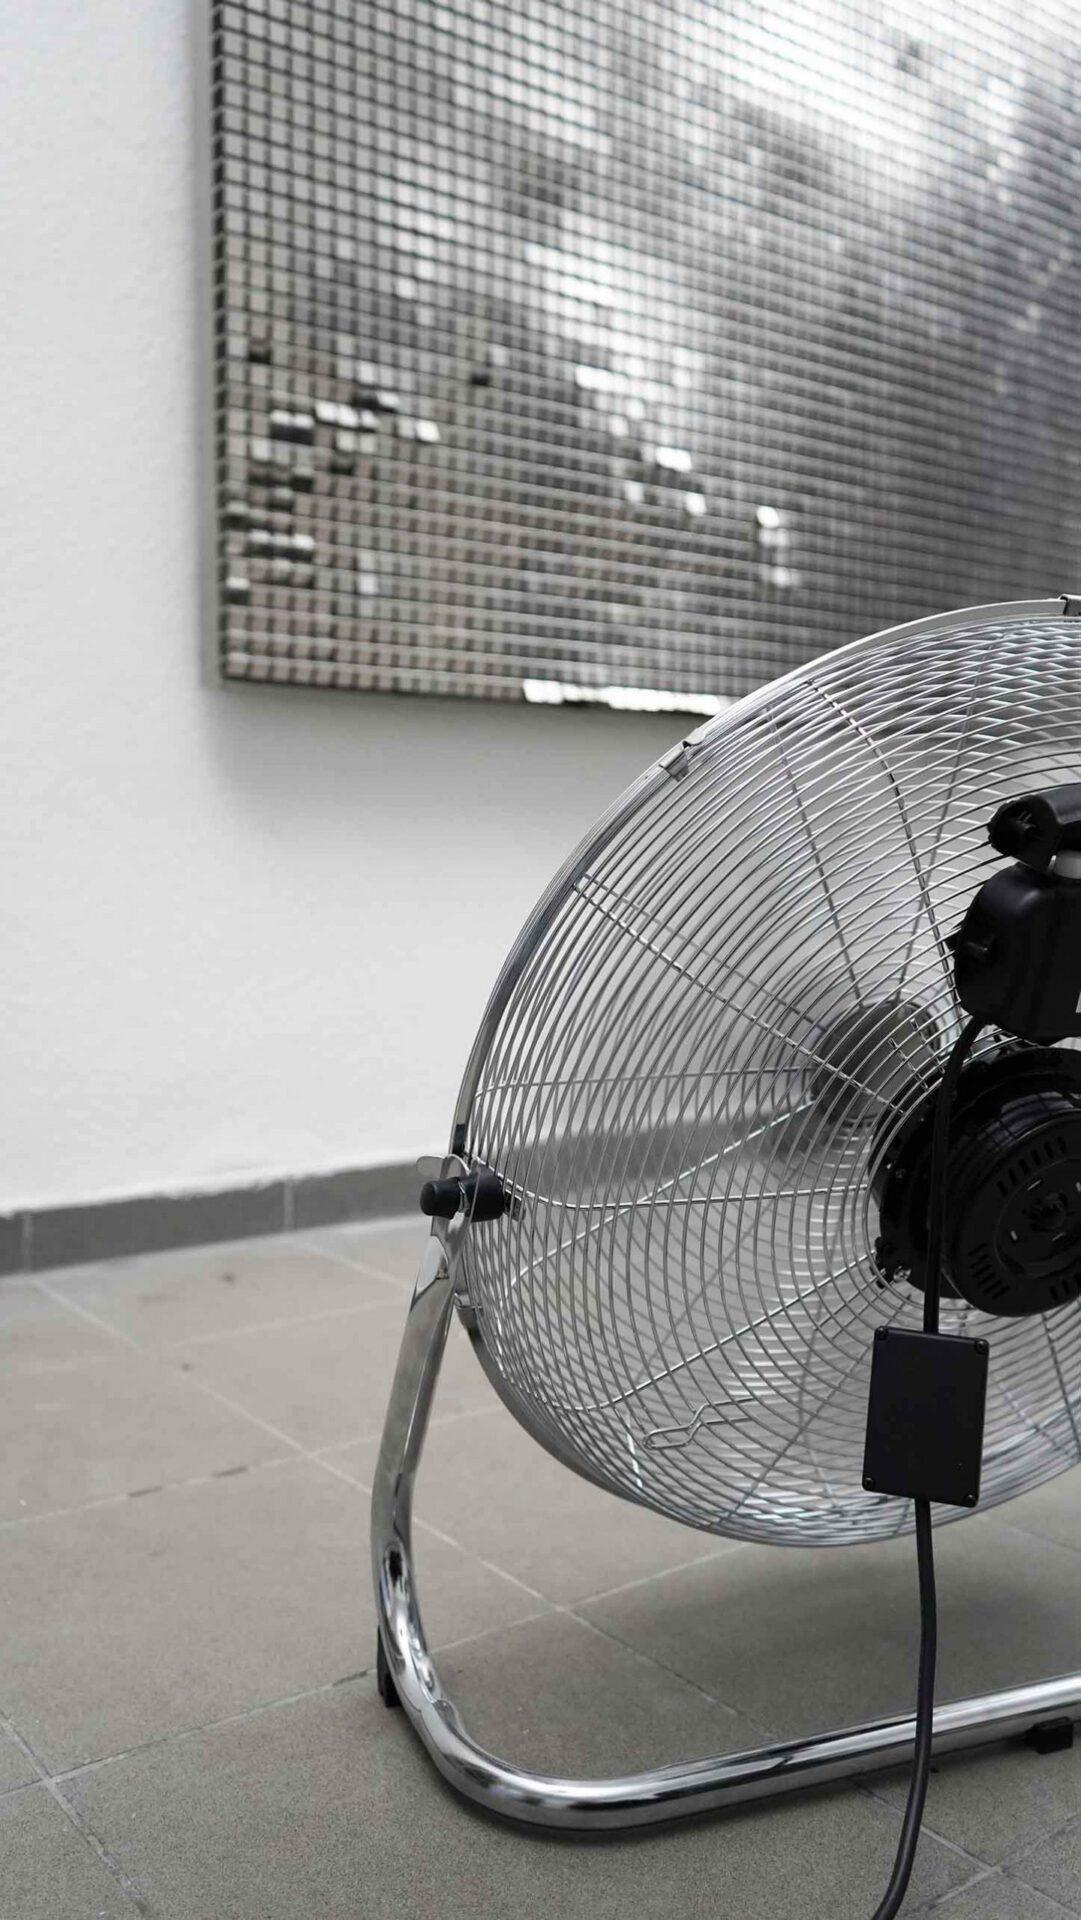 verena bachl wave fragment kinetic light art installation